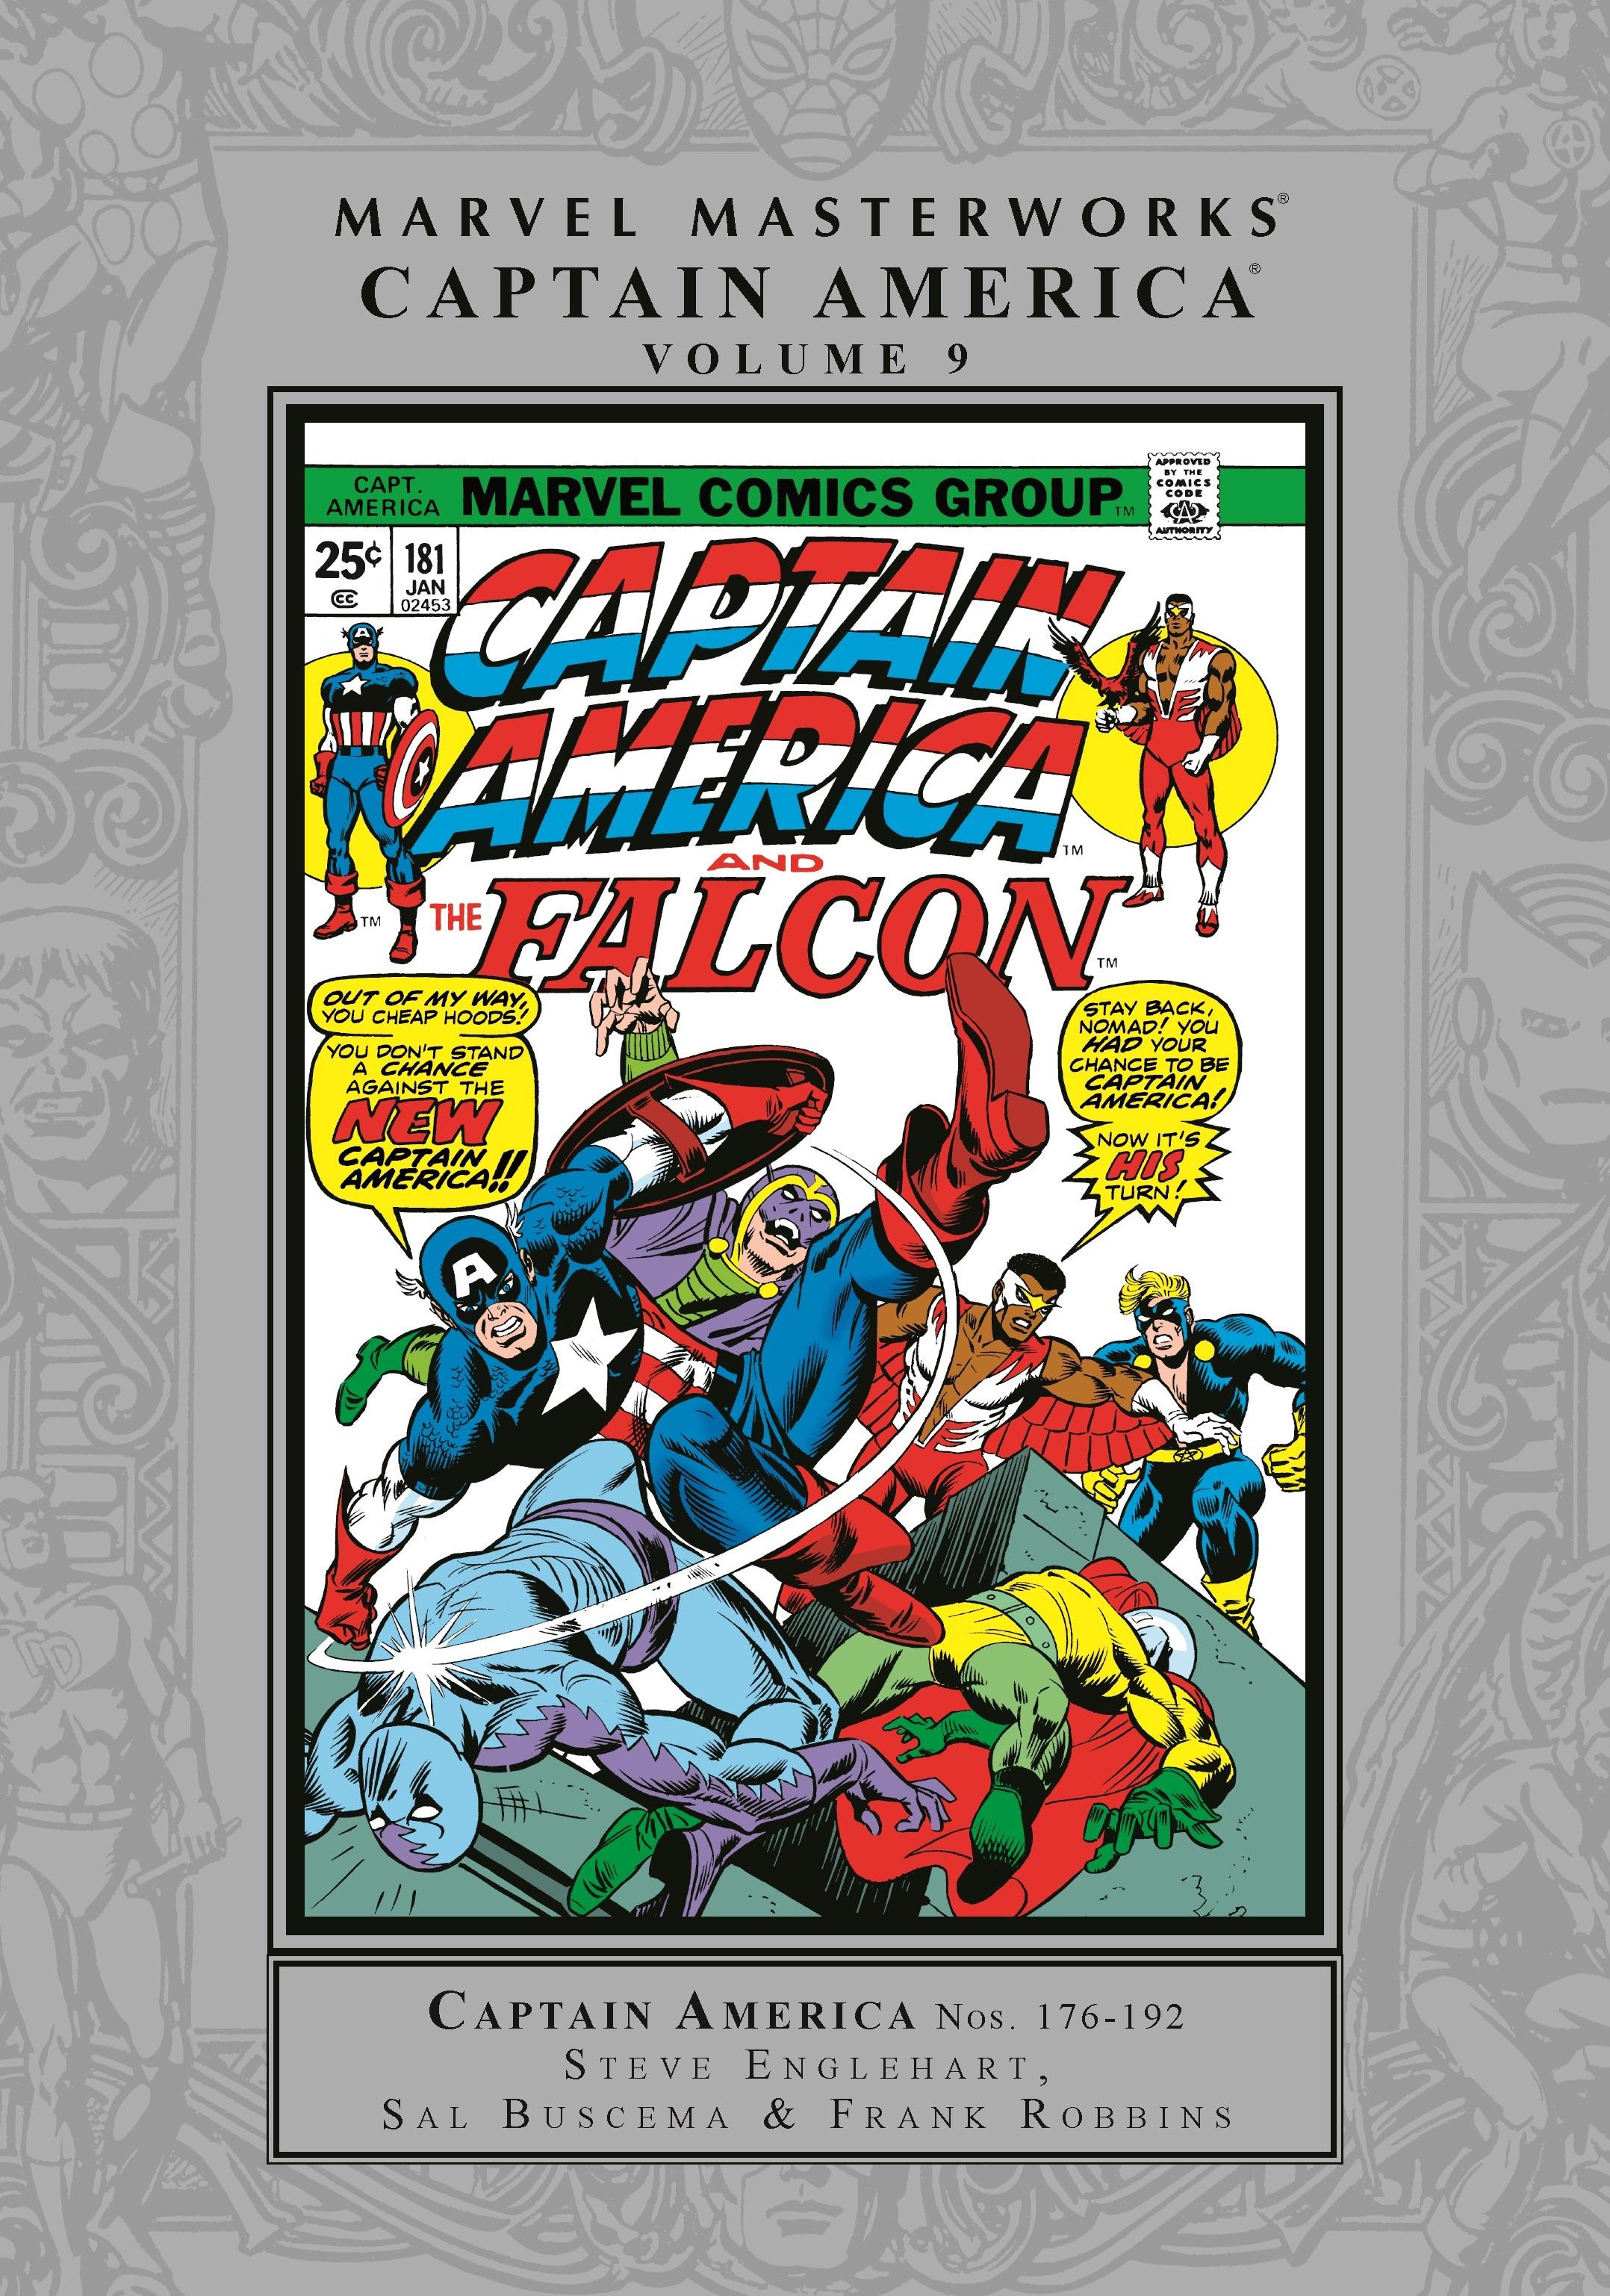 Marvel Masterworks: Captain America Vol. 9 (Hardcover)